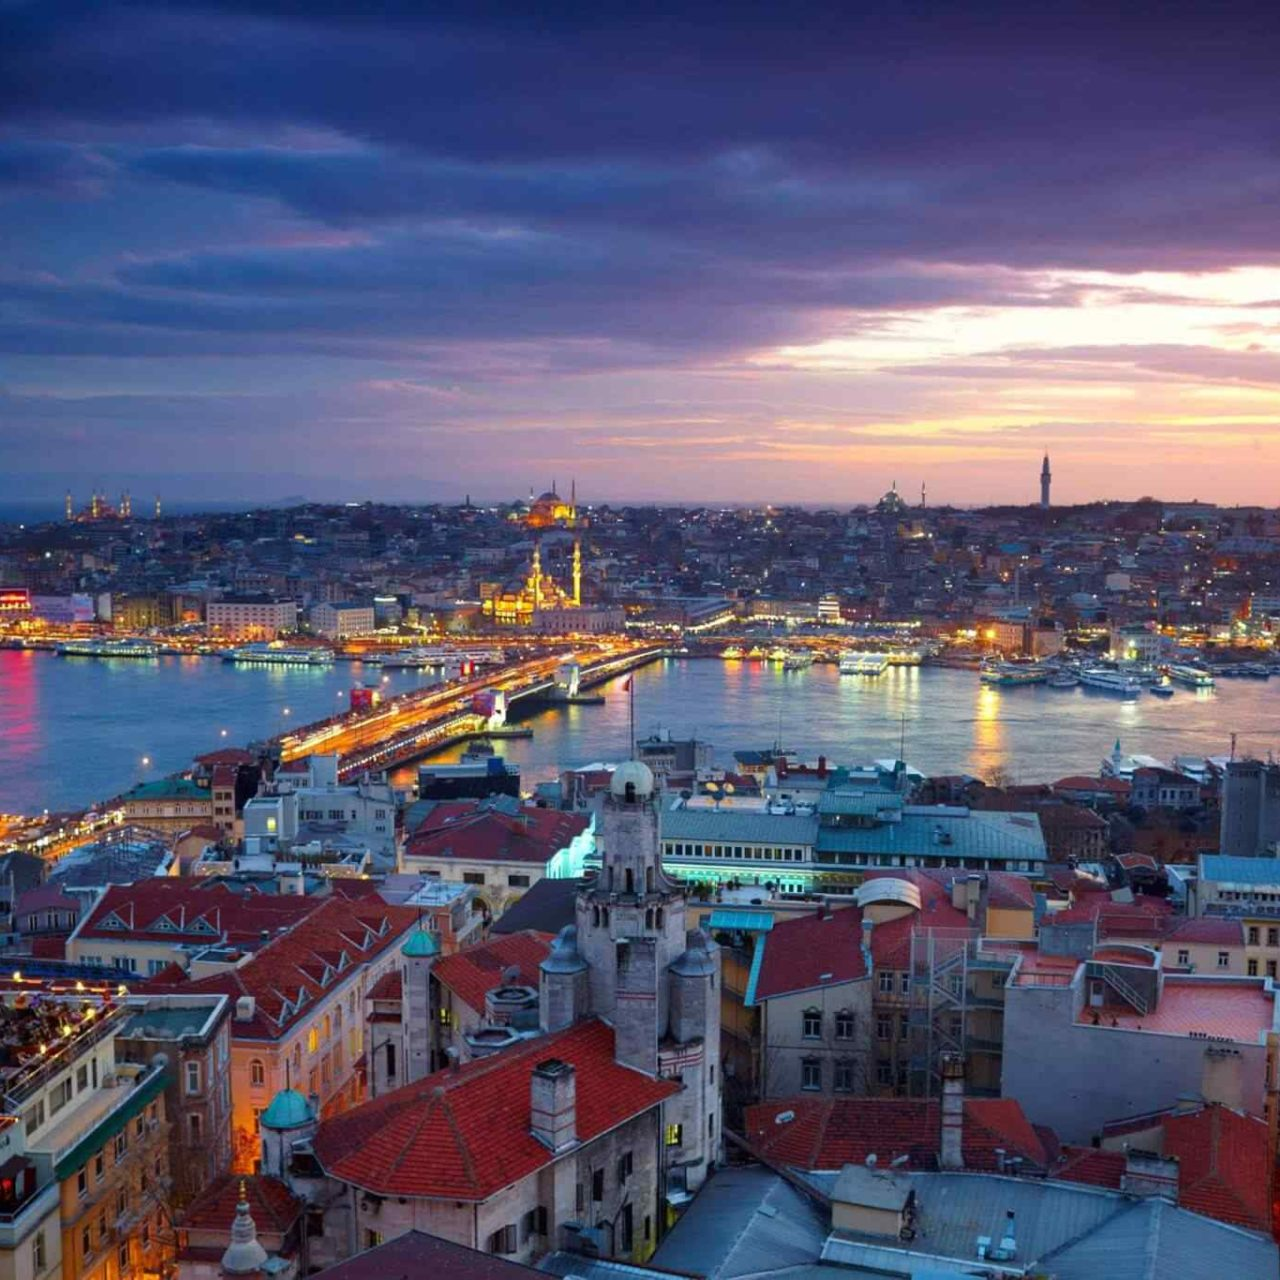 https://www.italiaholiday.it/wp-content/uploads/2018/09/destination-istanbul-01-1280x1280.jpg